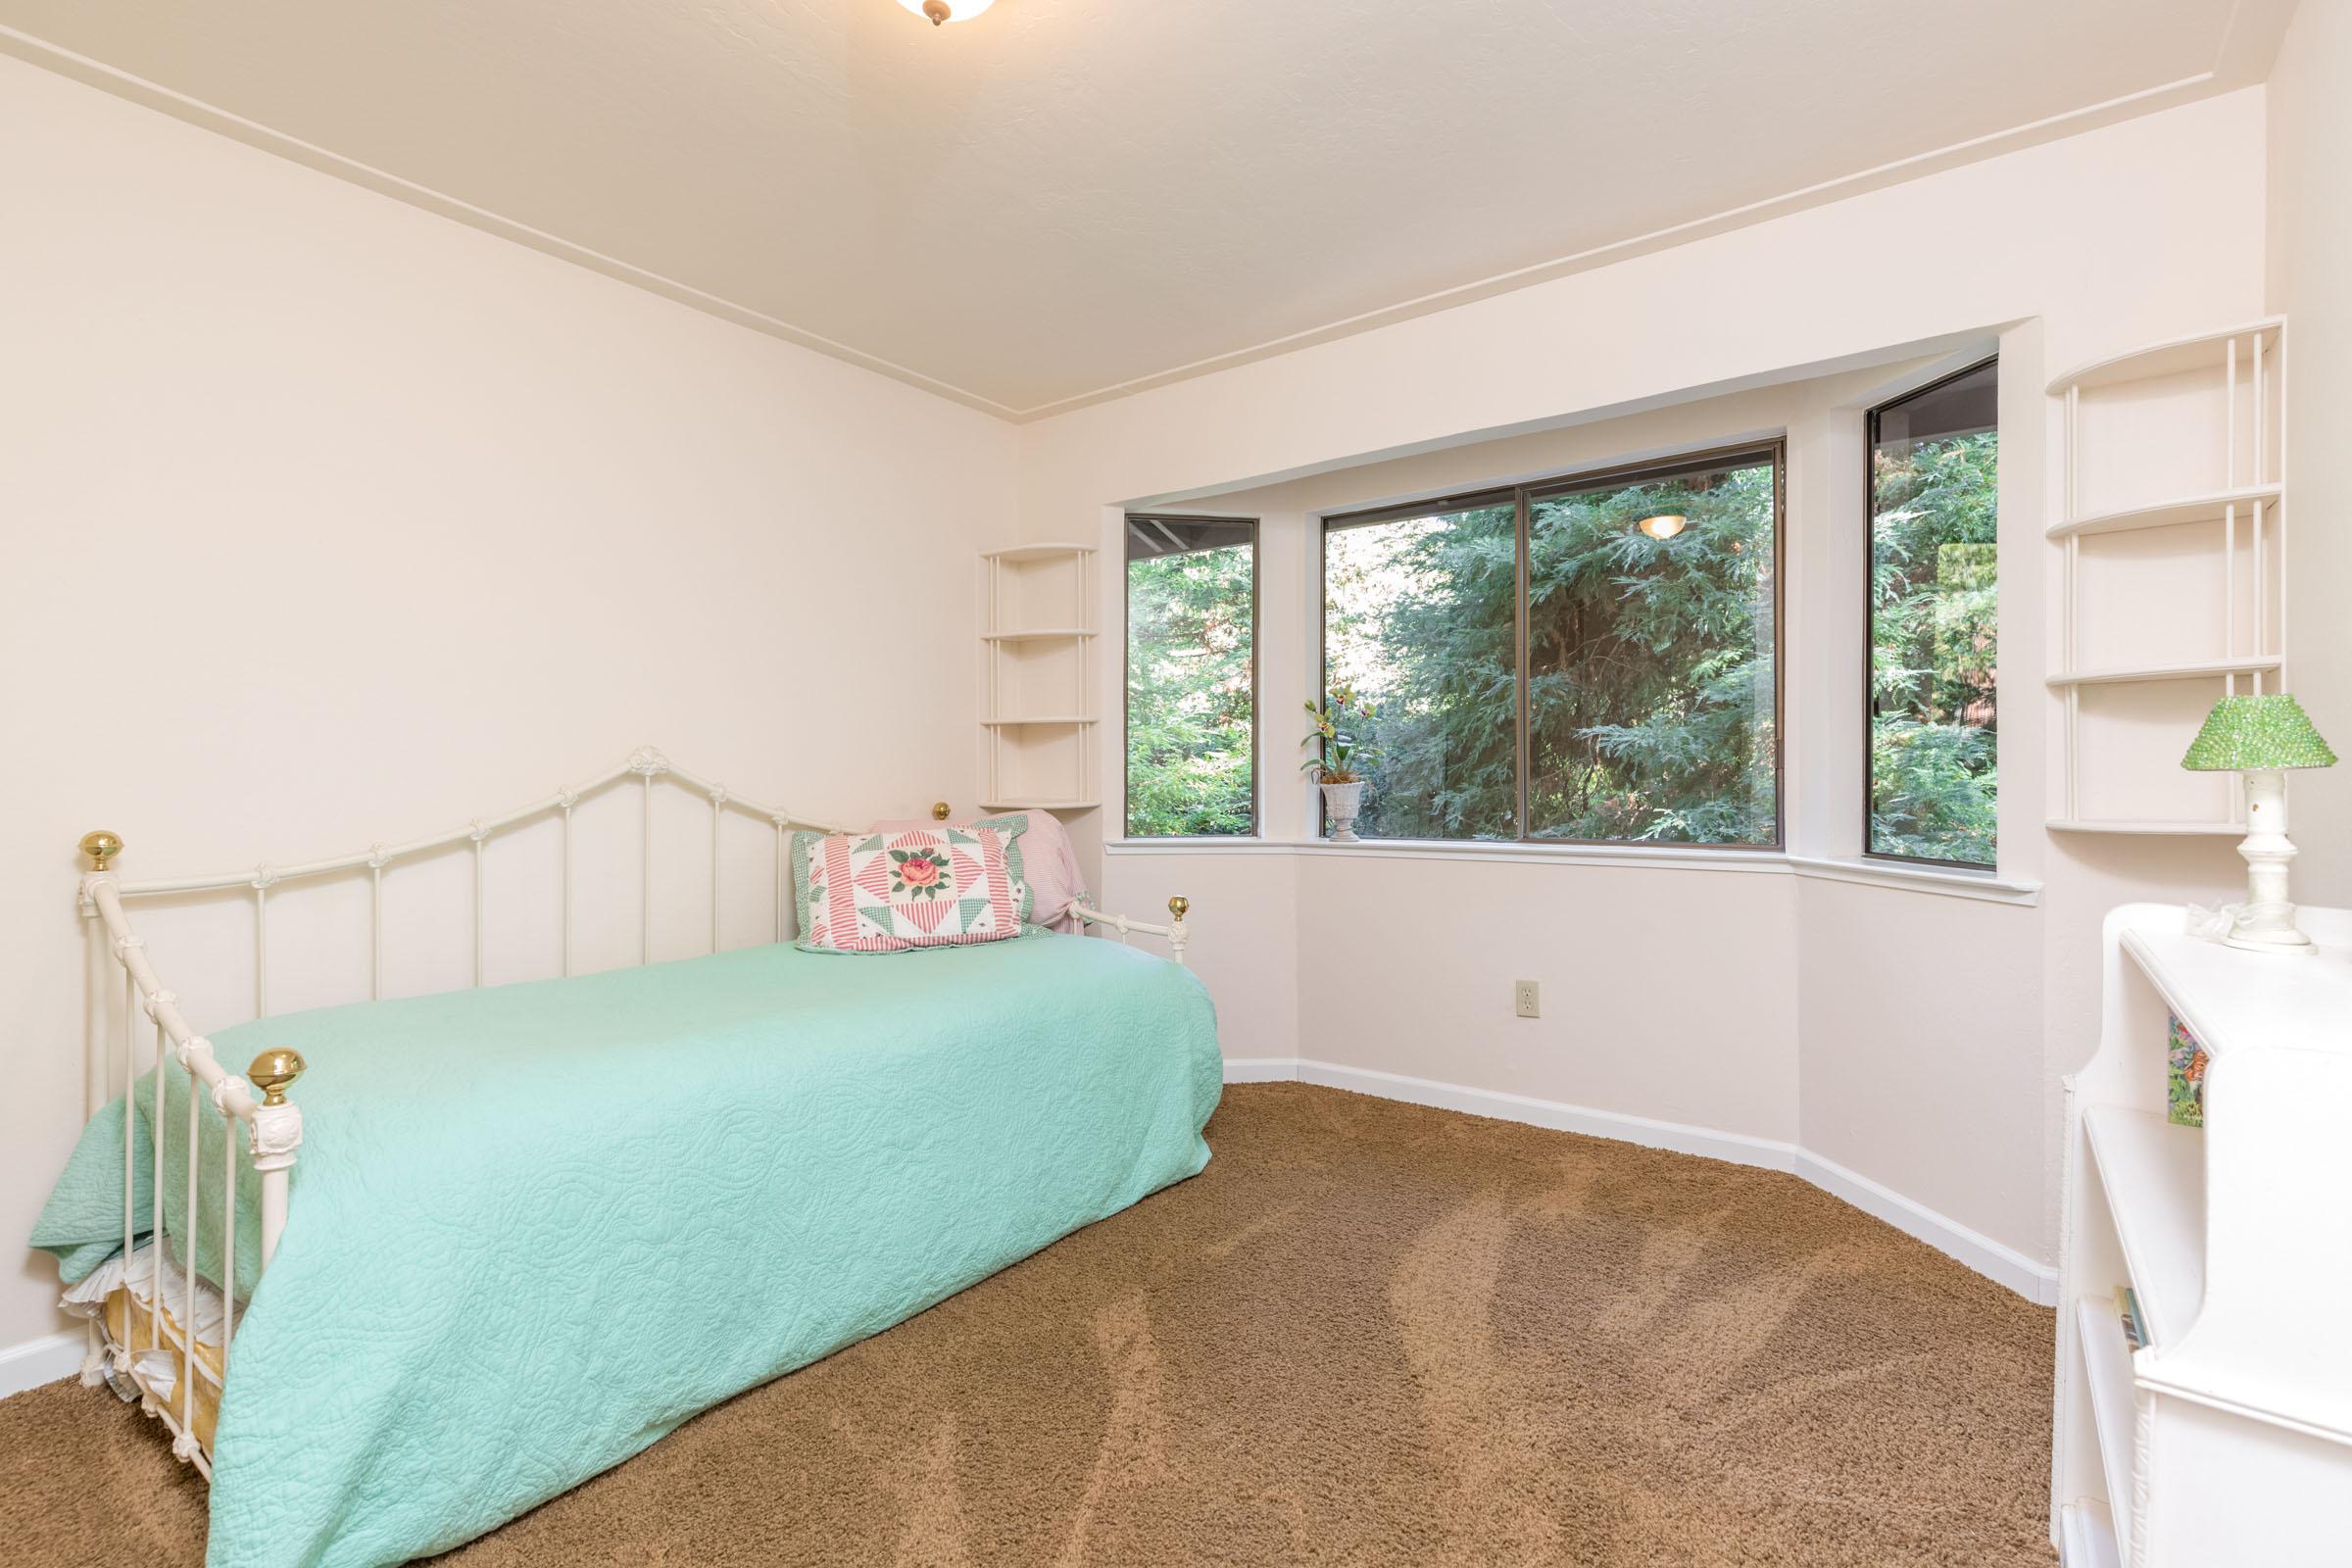 Real Estate Office In Santa Cruz